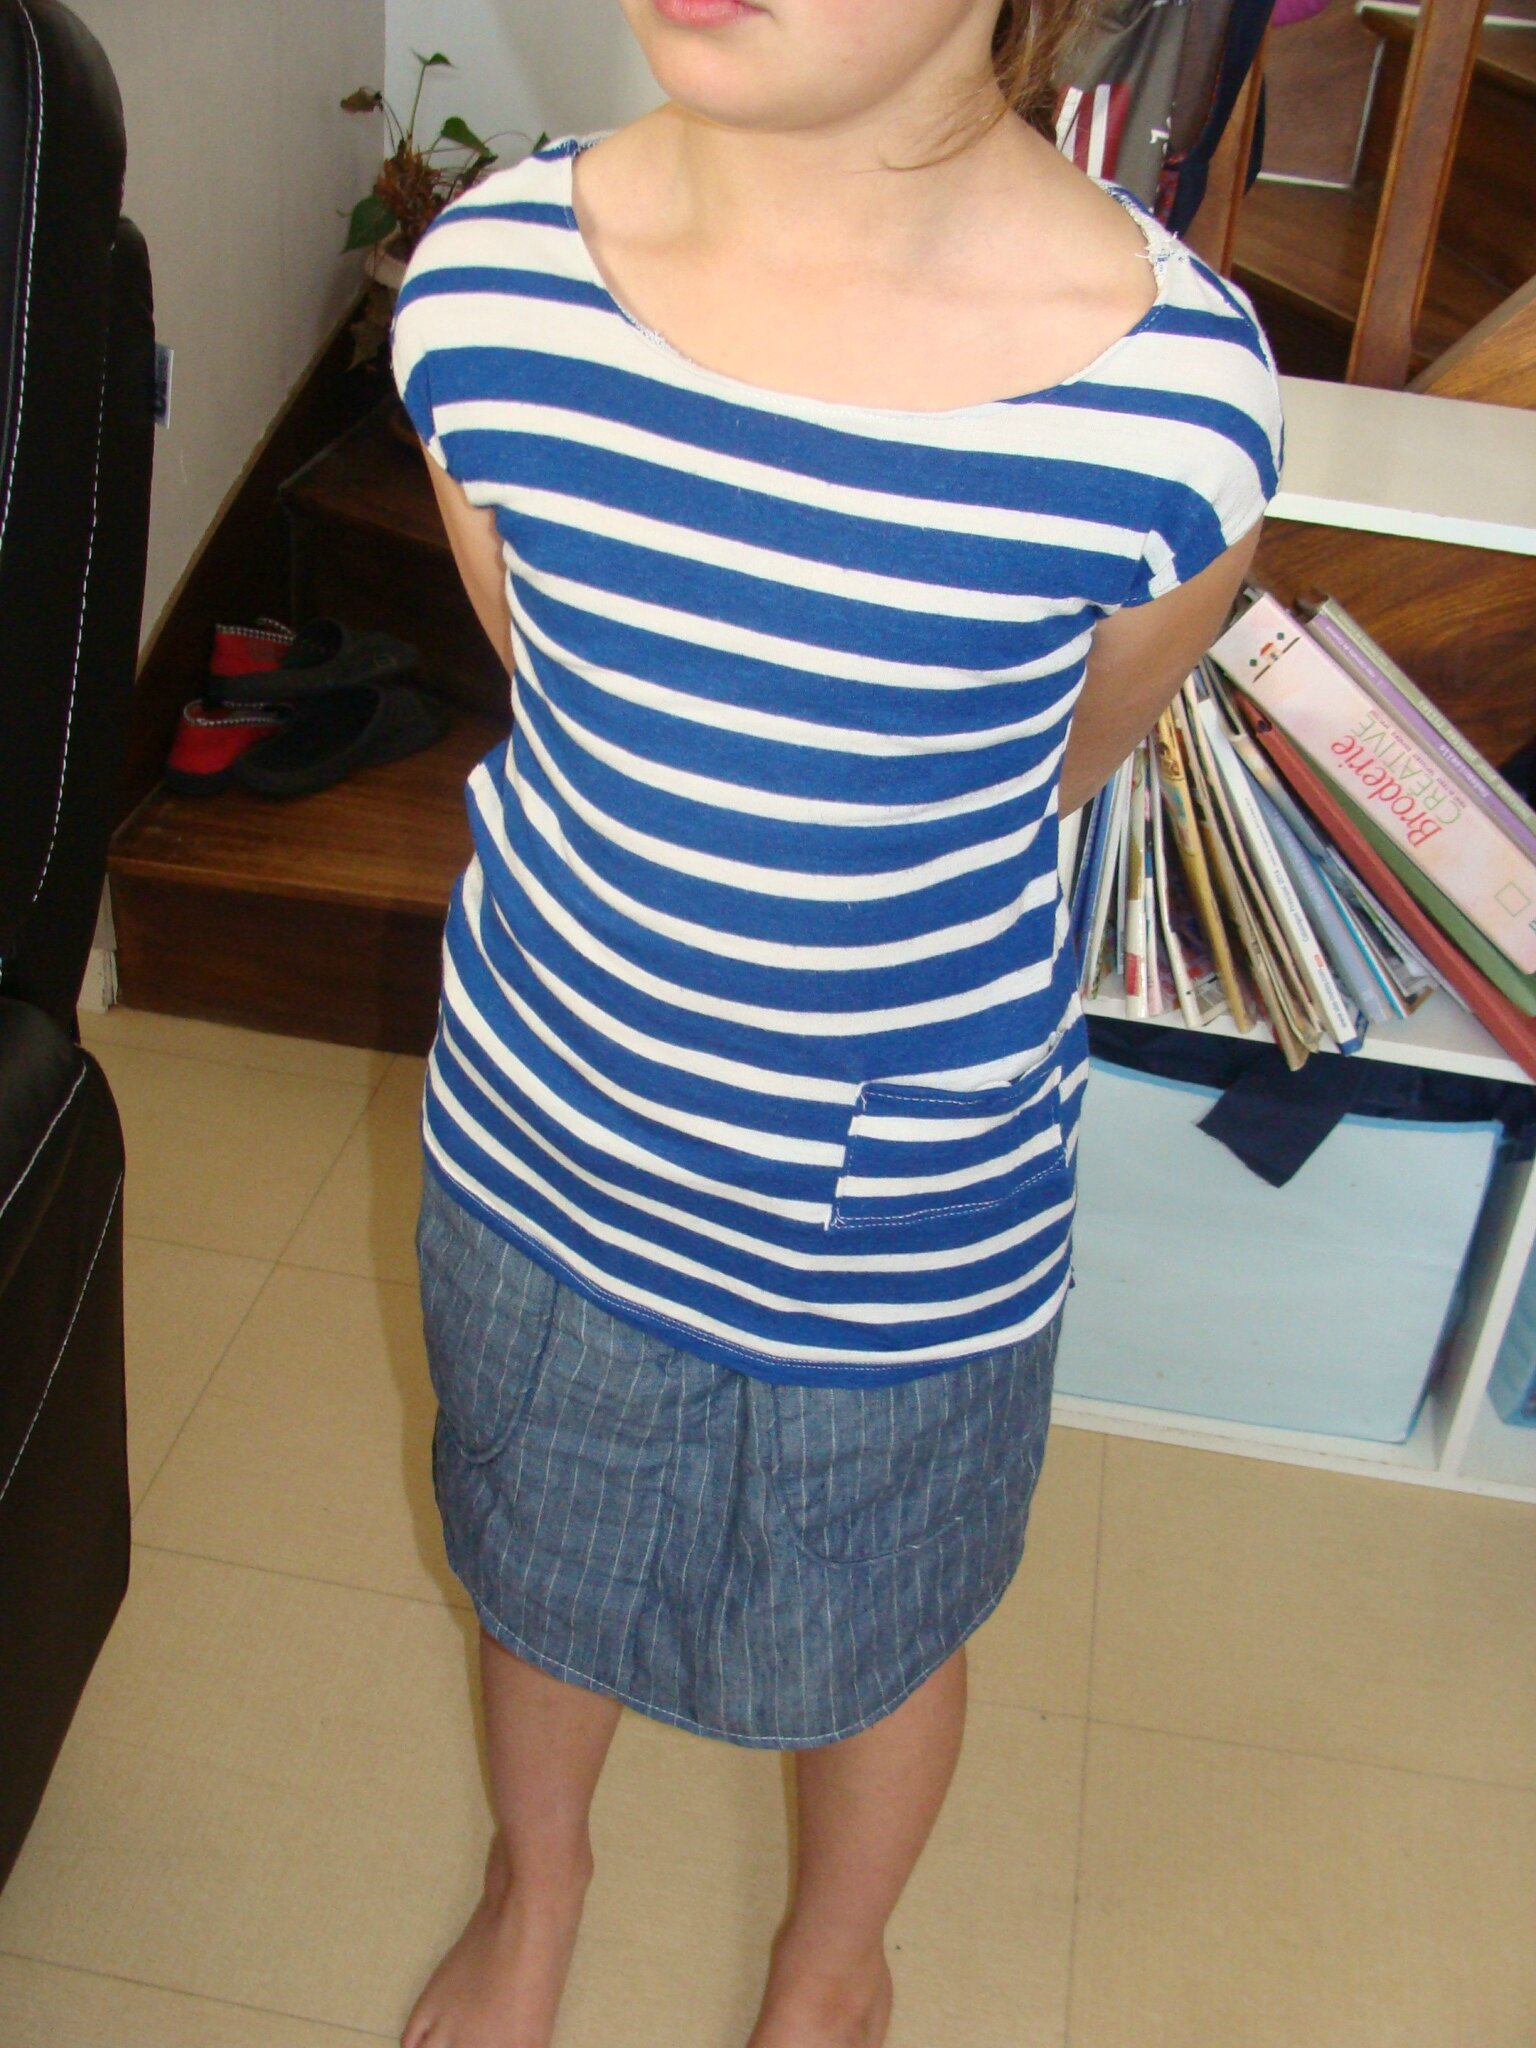 deuxième vies de mes vêtements